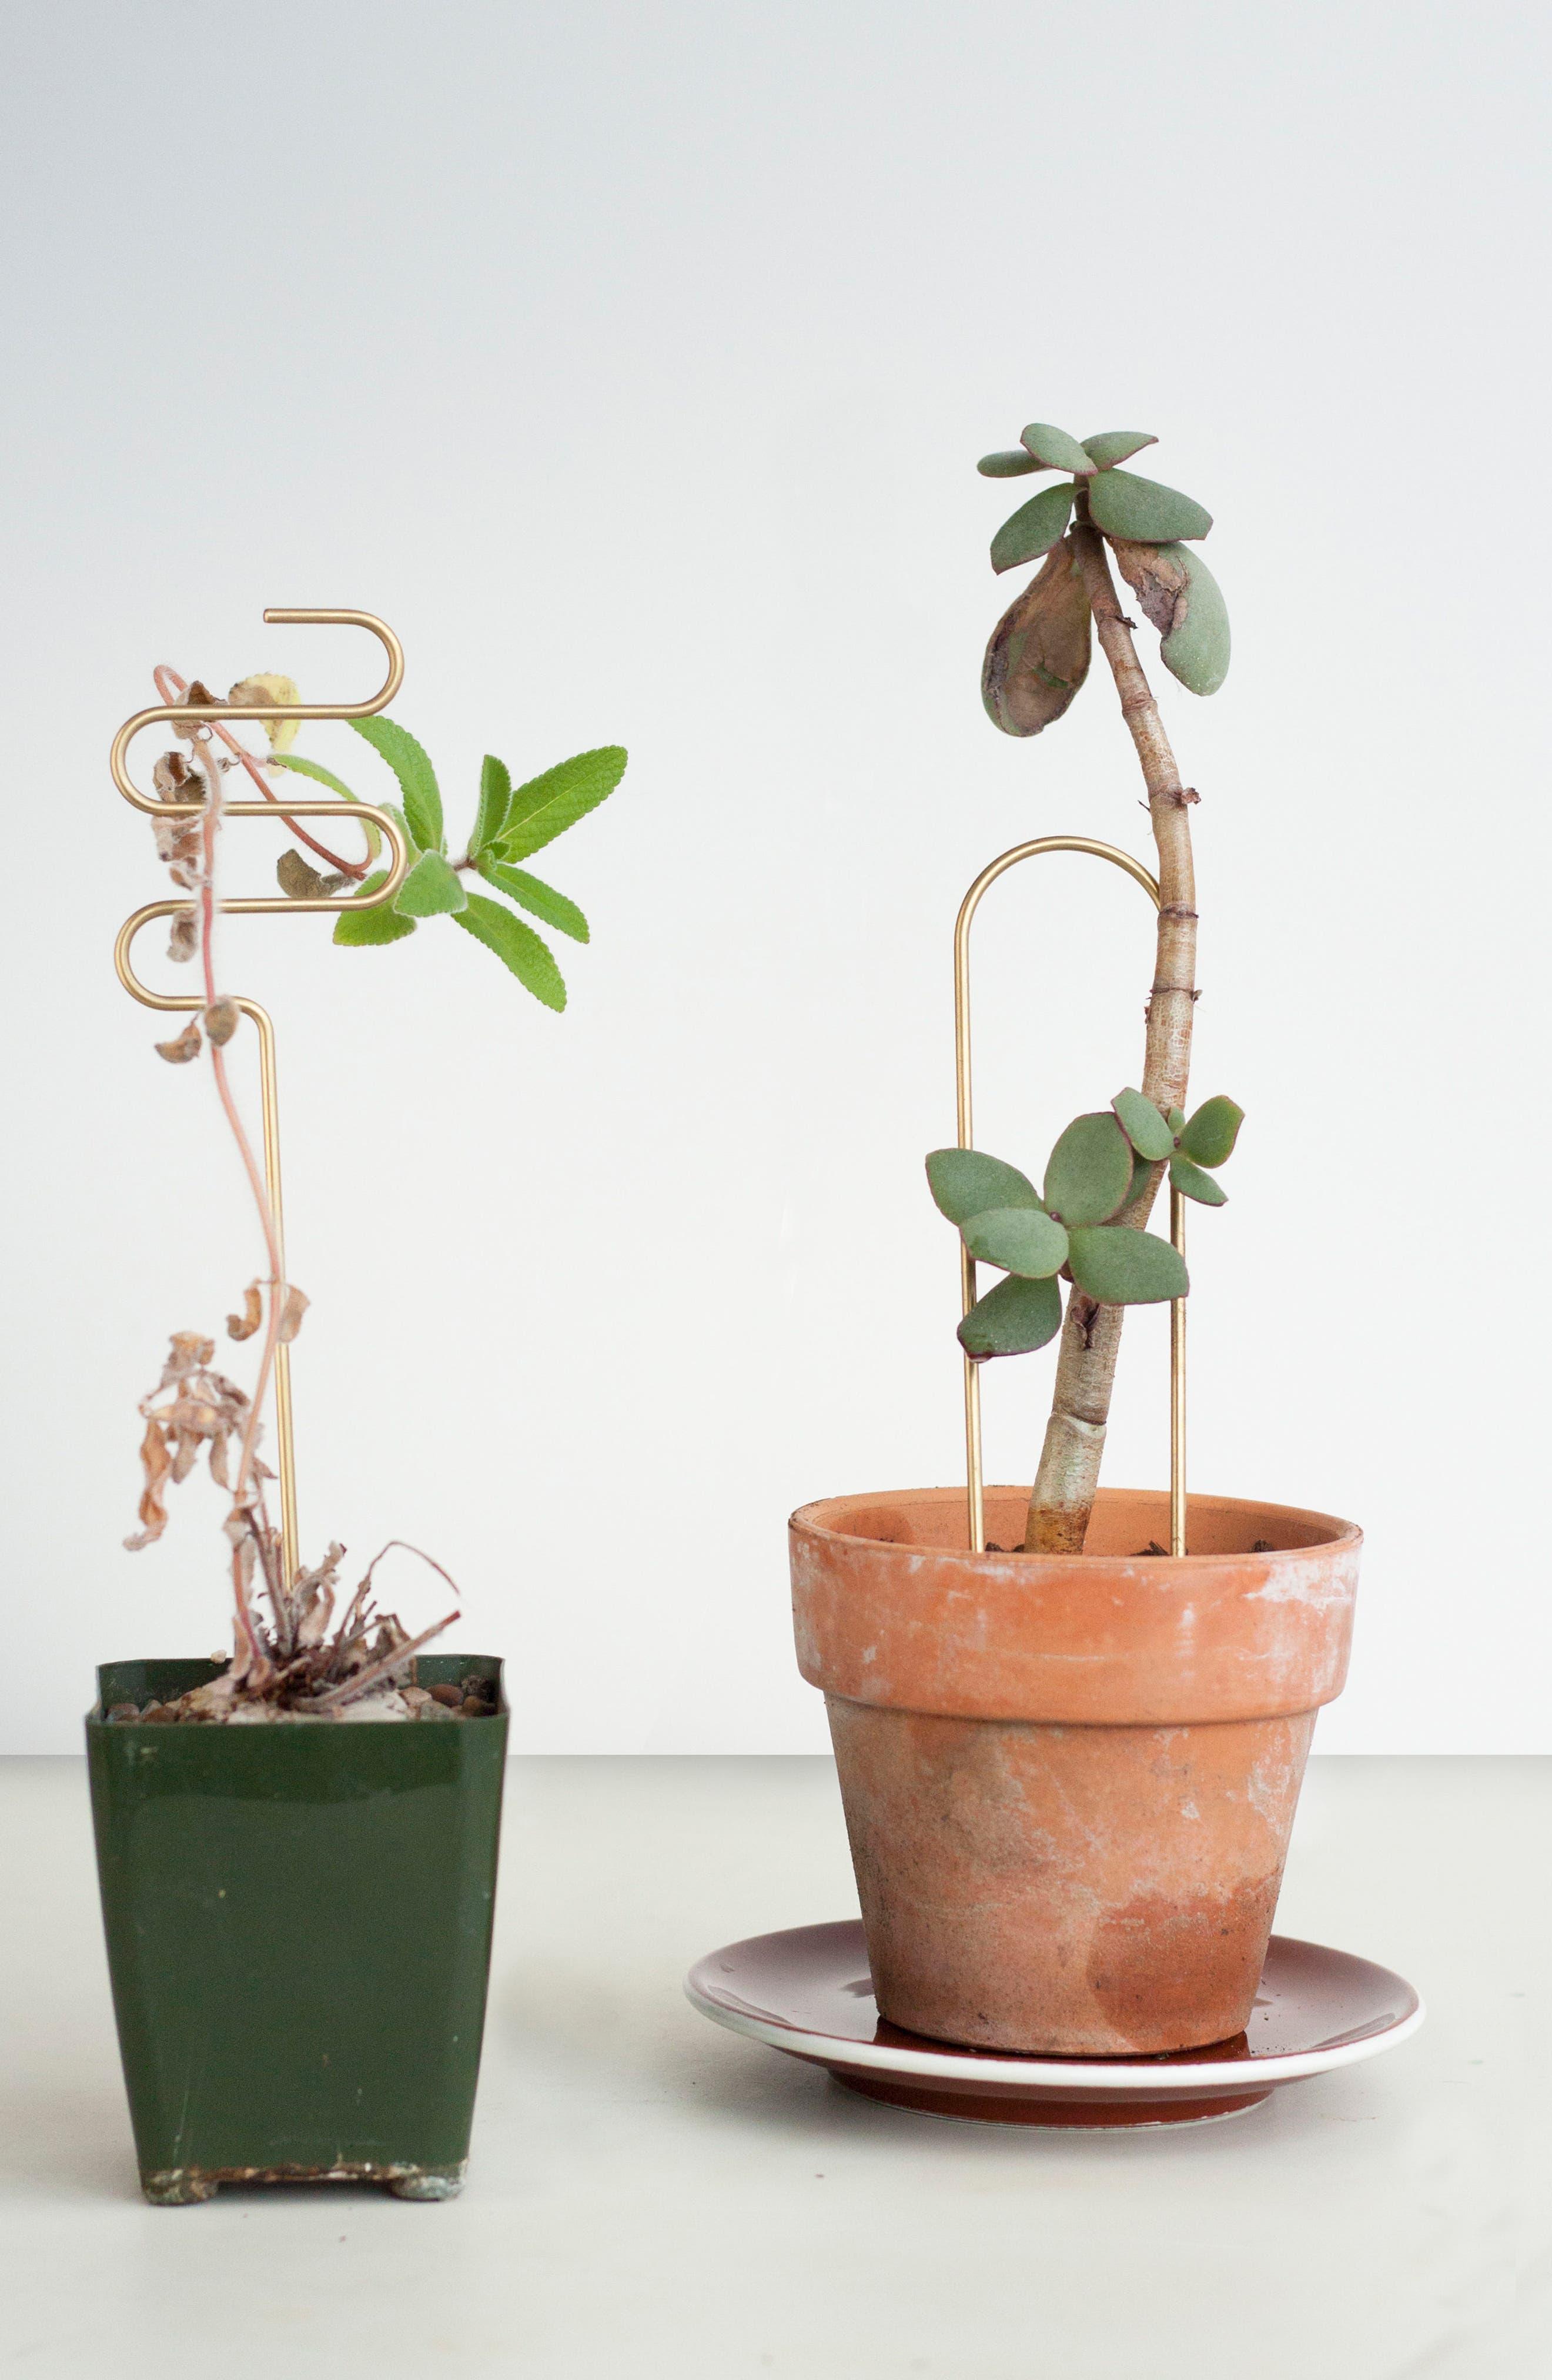 Set of 3 Plant Sticks,                             Alternate thumbnail 11, color,                             BRASS